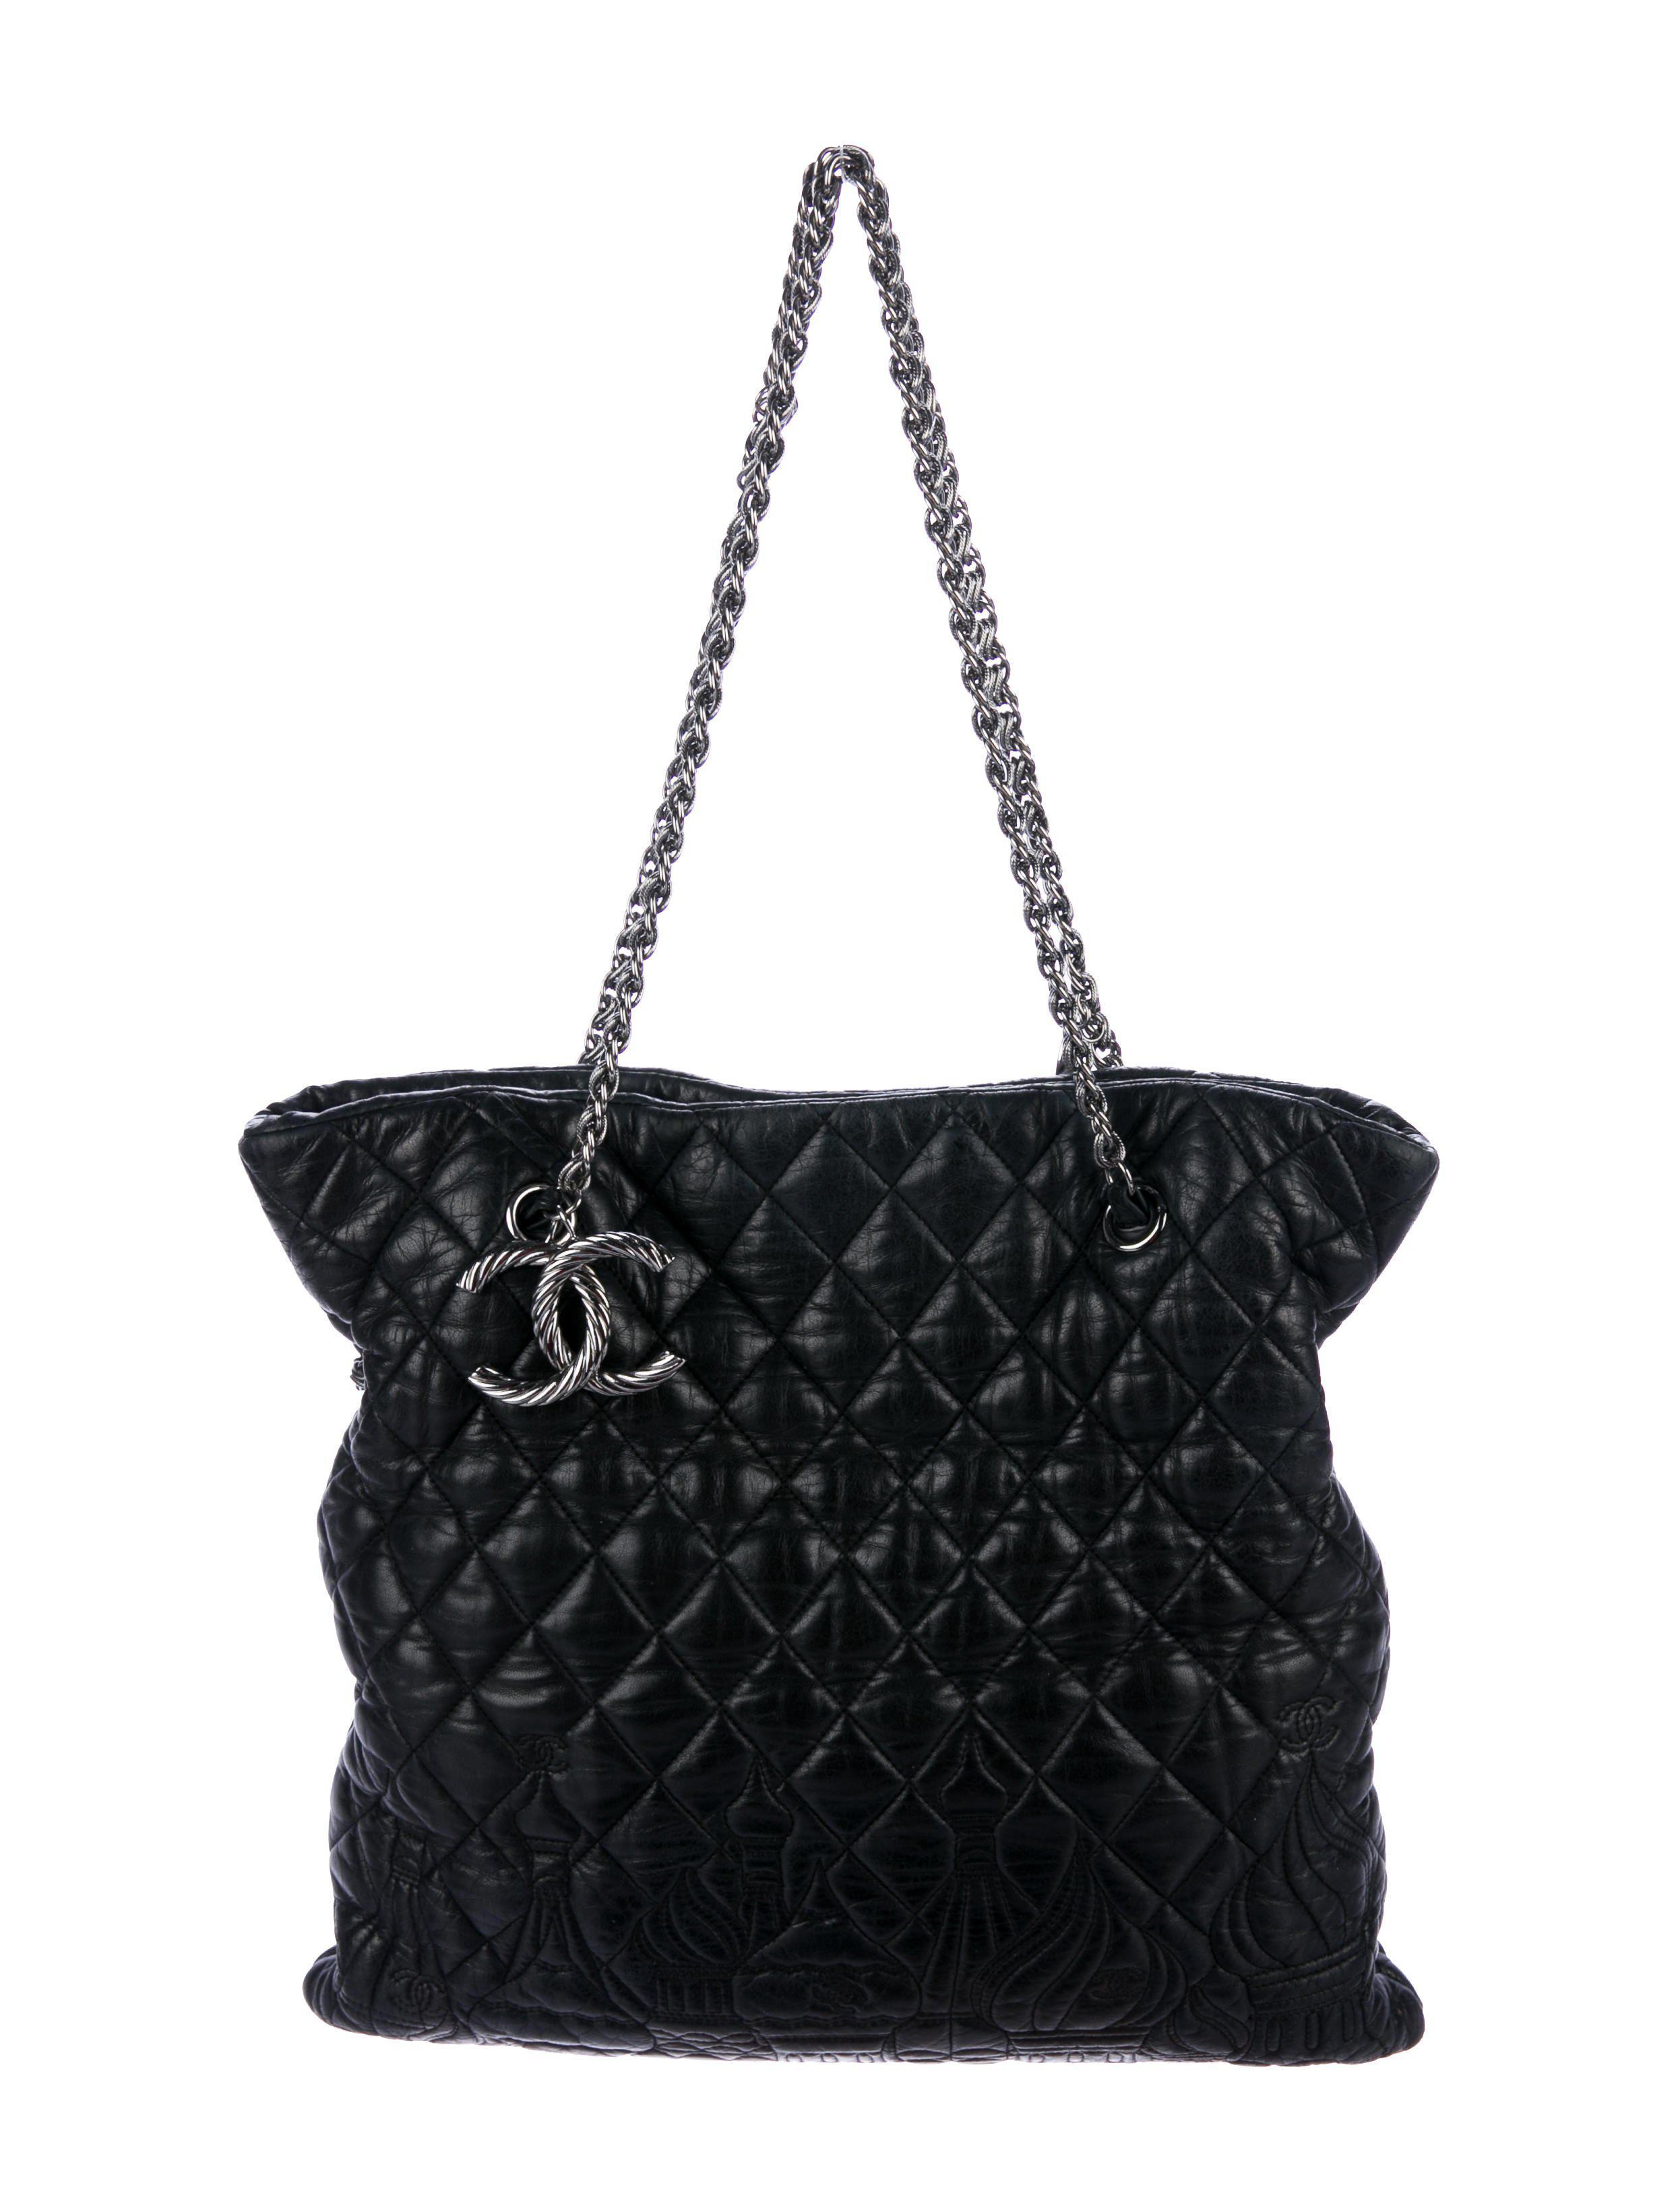 cae47004645 Lyst - Chanel Red Square Kremlin Tote in Black